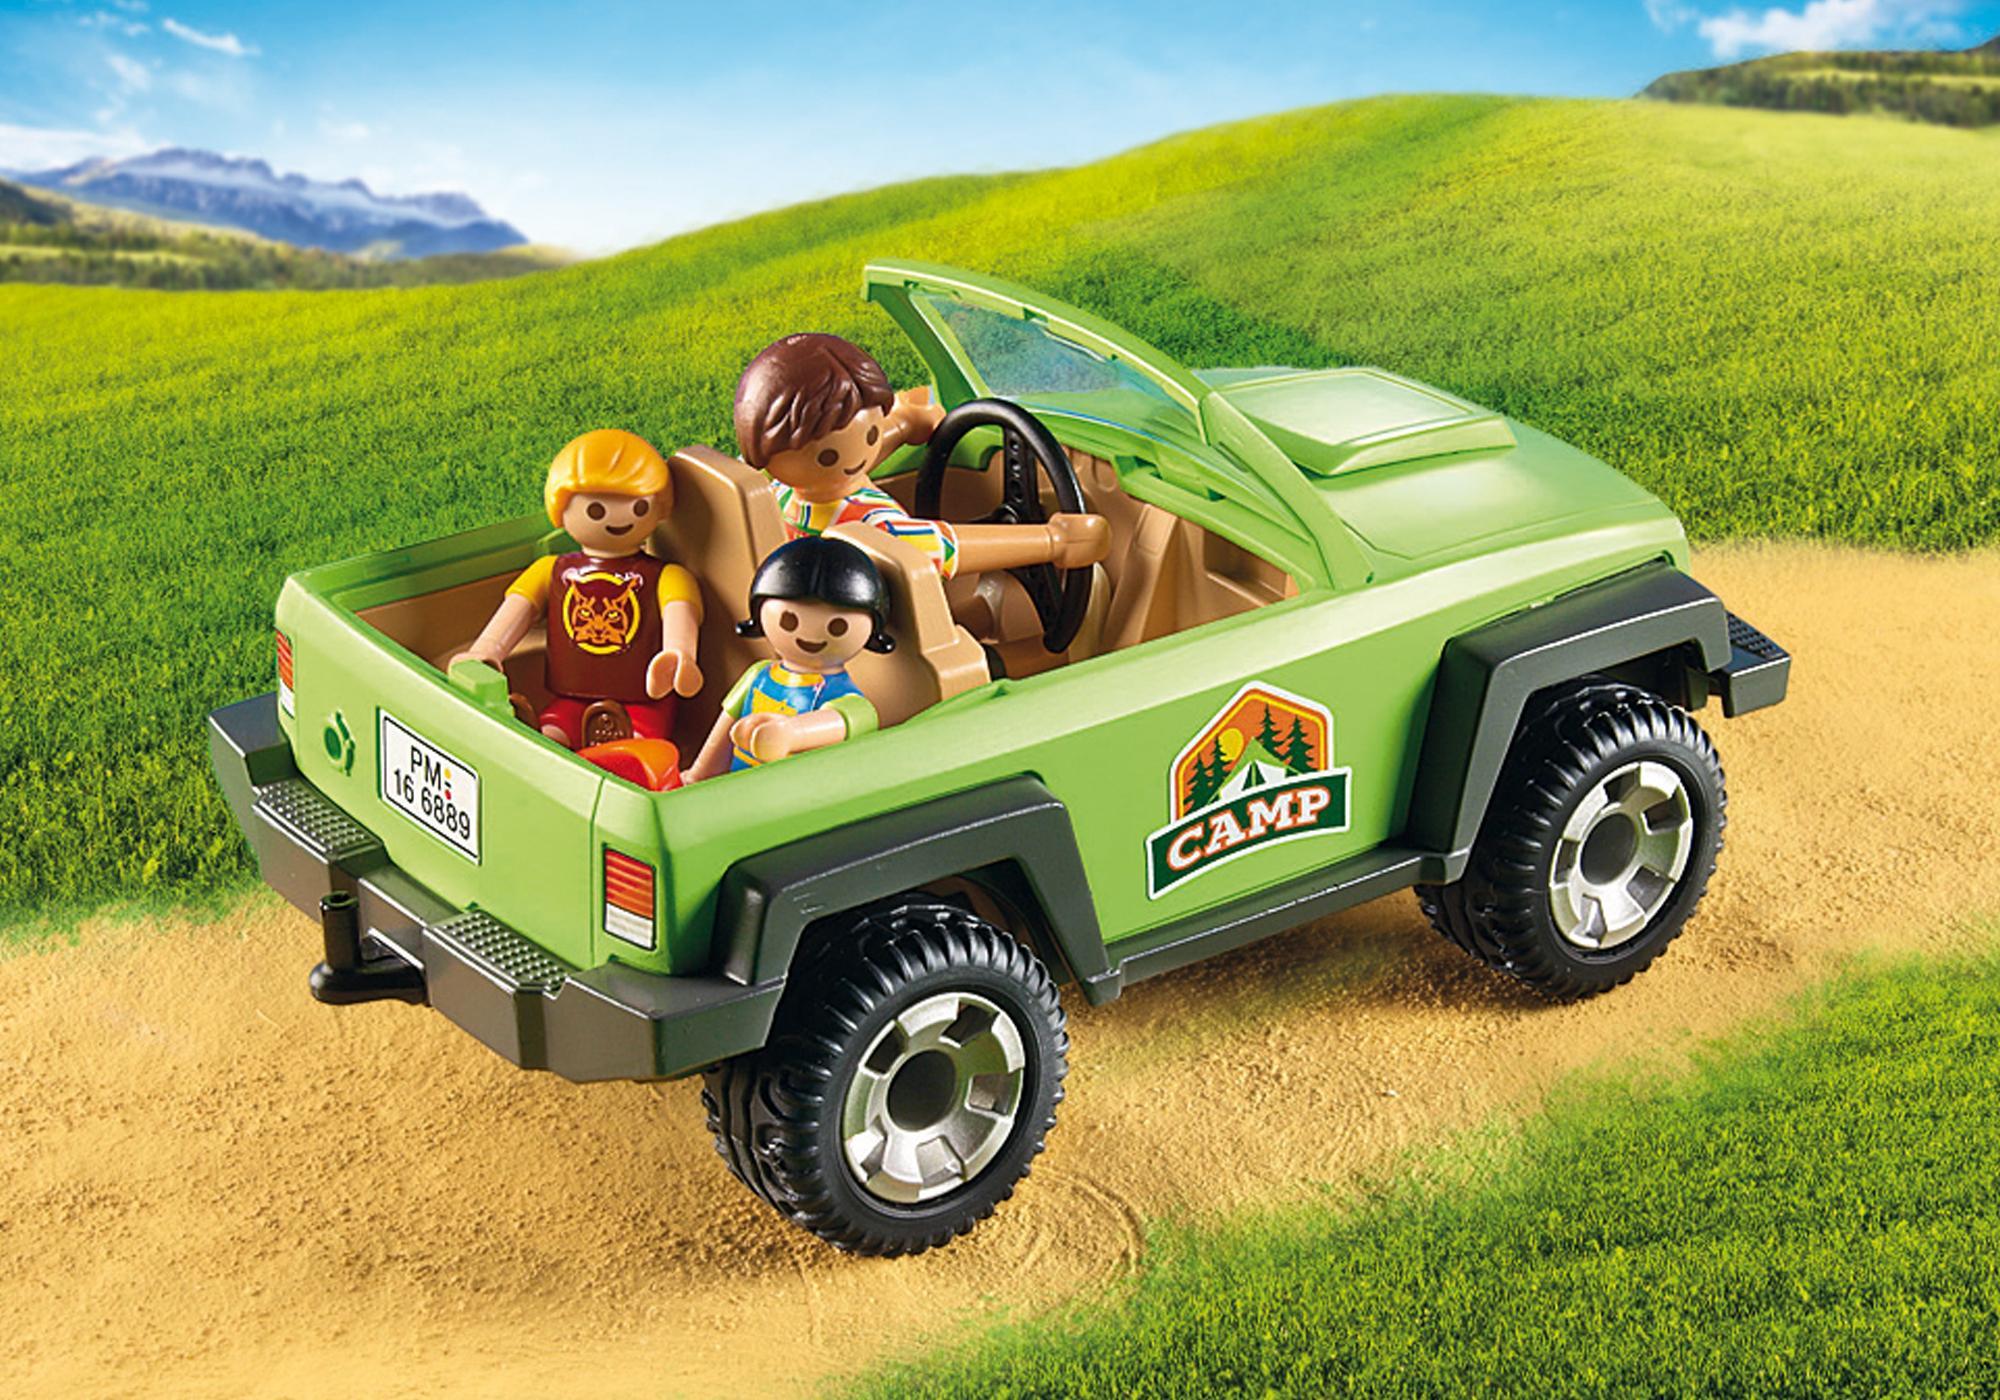 http://media.playmobil.com/i/playmobil/9154_product_extra2/Vehículo 4X4 con Canoa